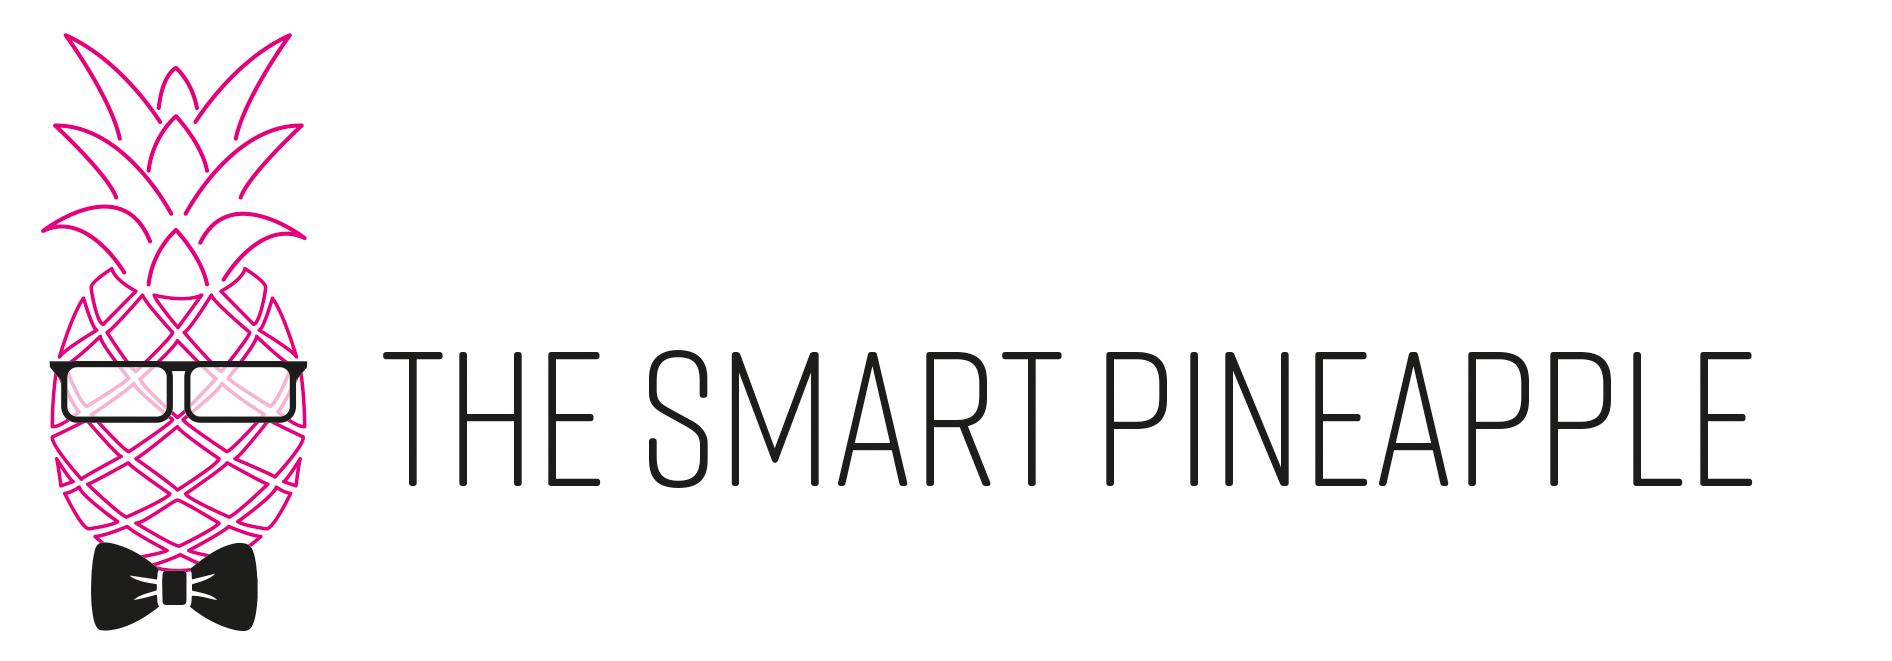 The Smart Pineapple